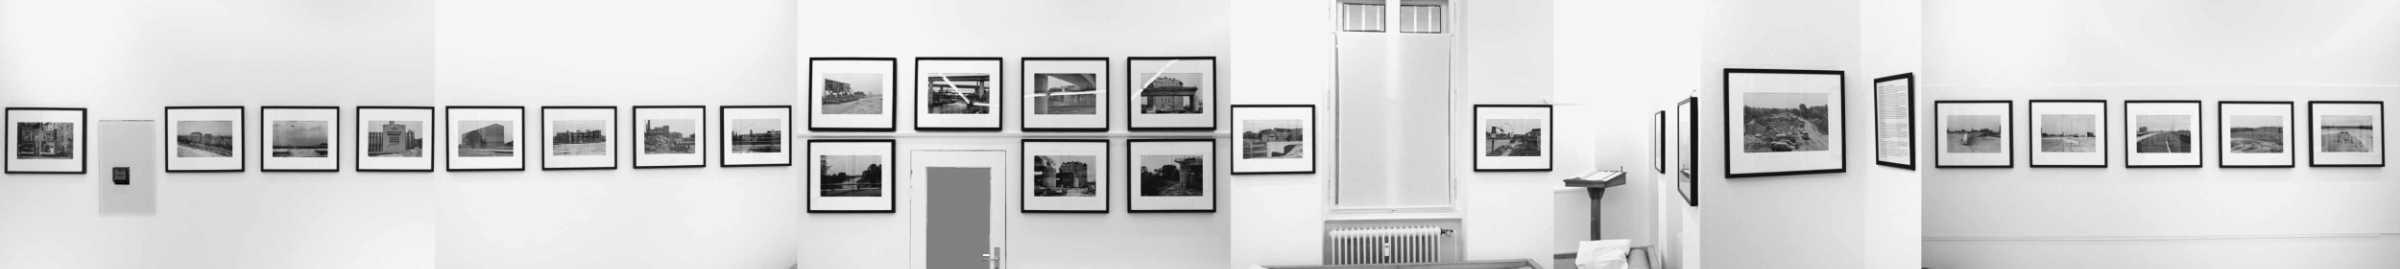 »Die Hängung des Tempelhofer Kreuzes‹ im ›Atelier André Kirchner‹ im Januar/Februar 2020«, Fotos © Friedhelm Denkeler 2020